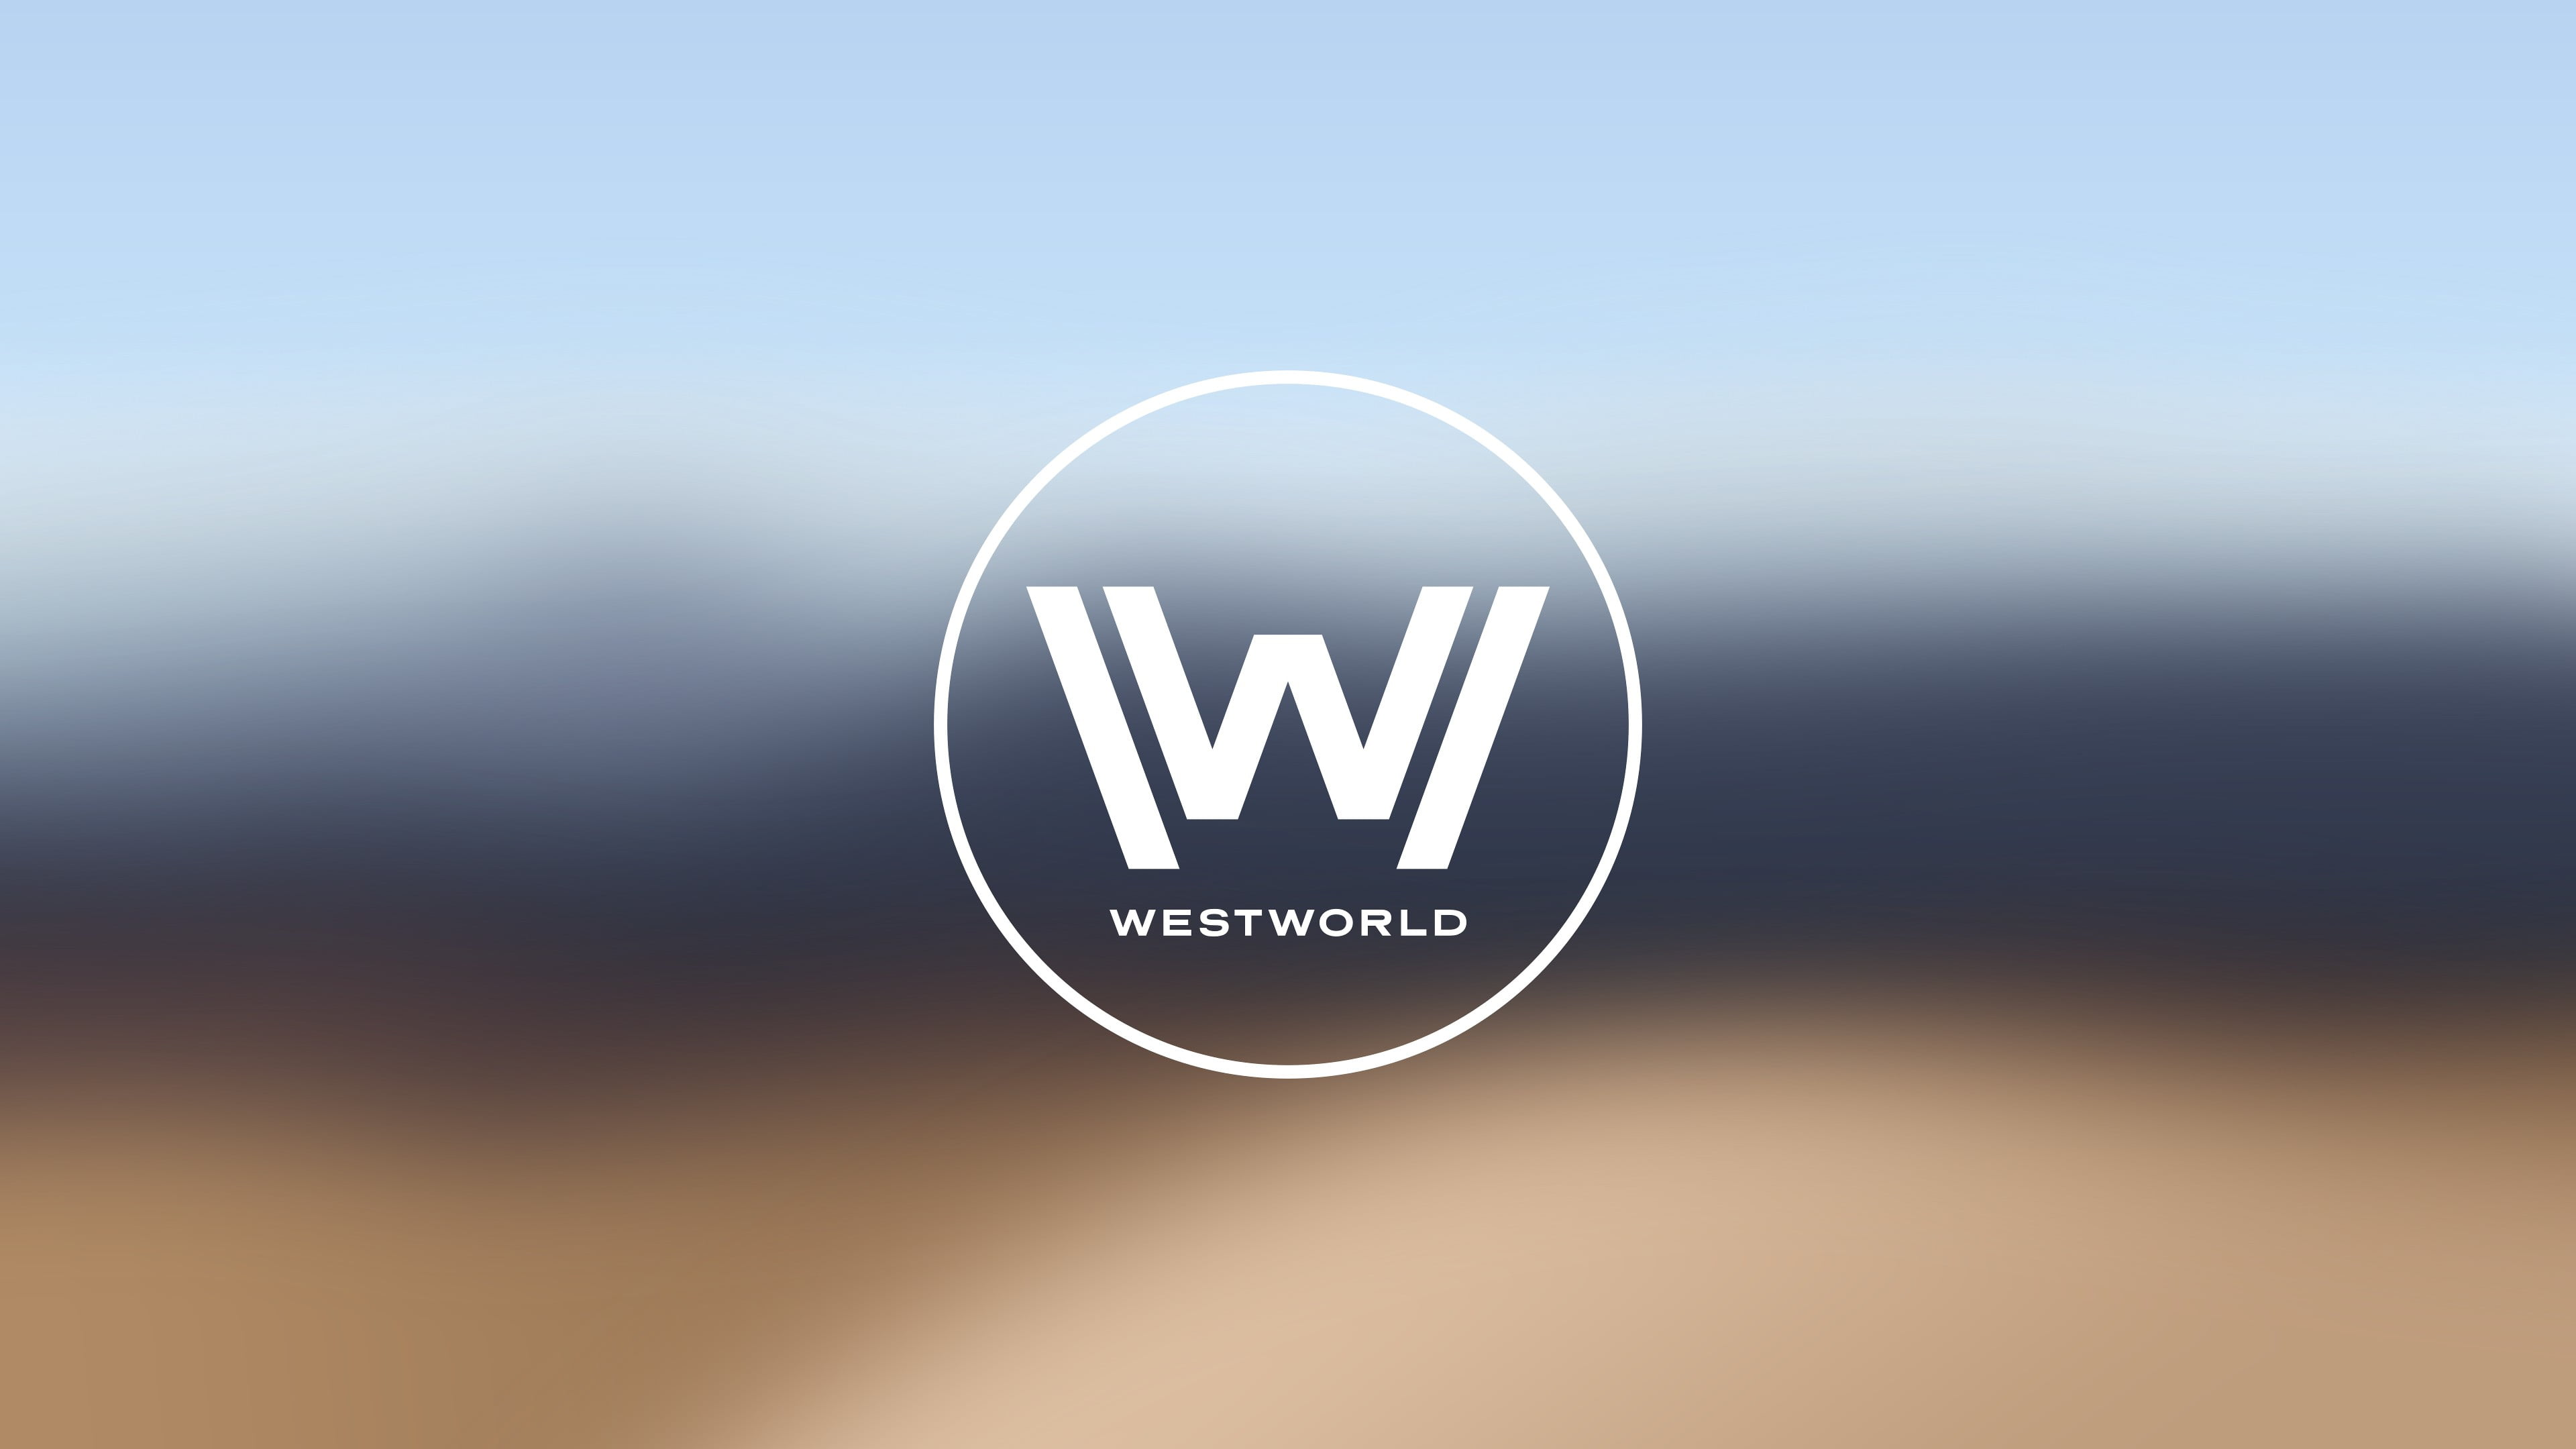 Letter W logo, westworld, tv series, minimalism HD wallpaper.